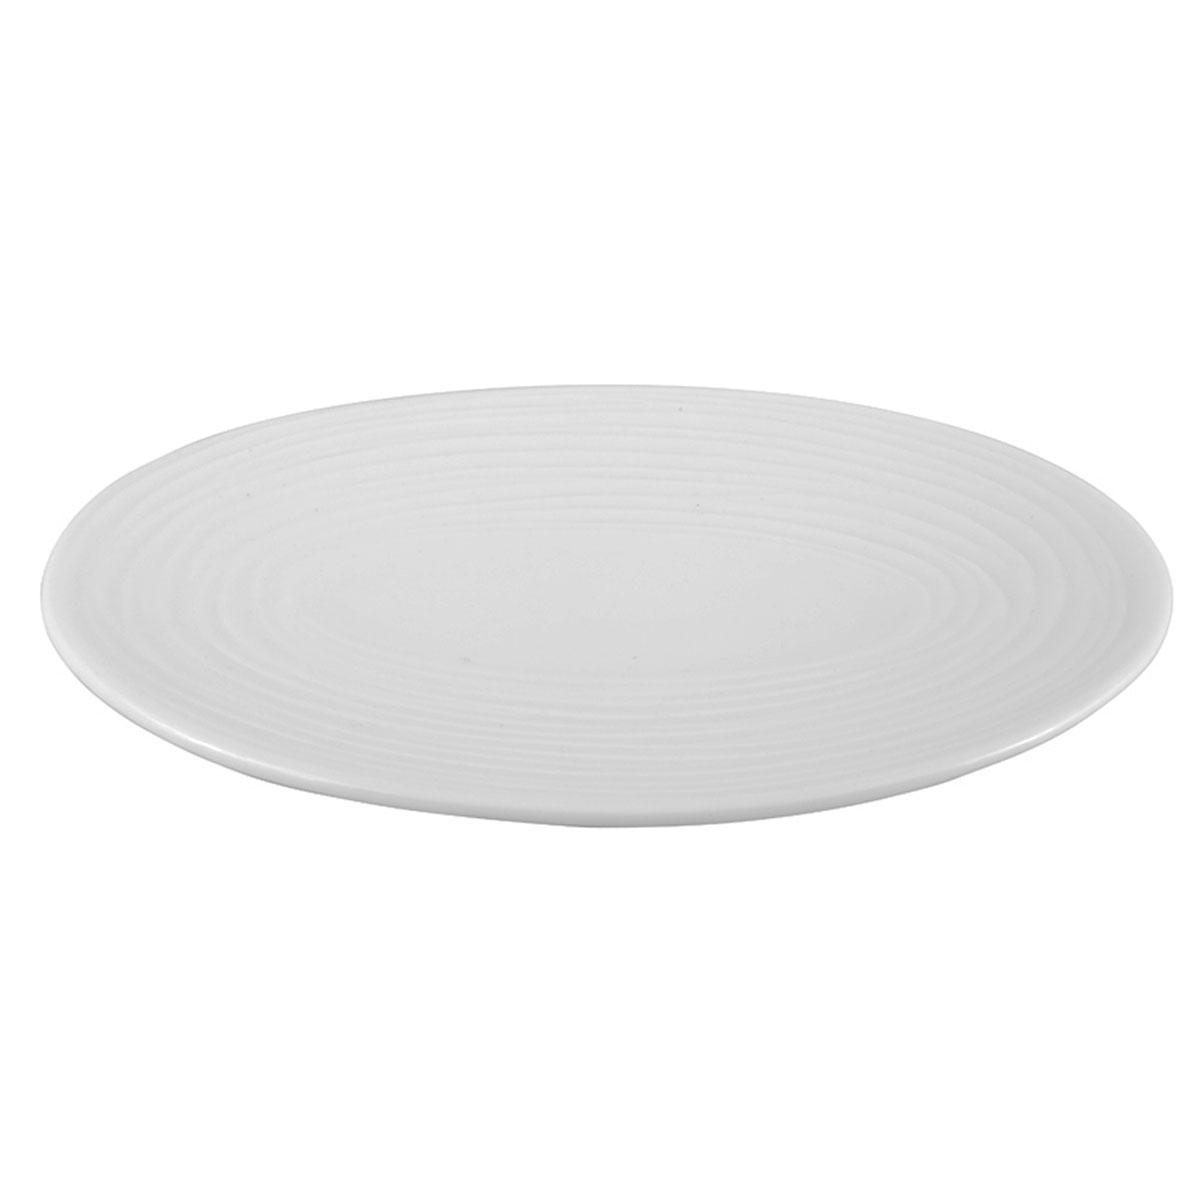 Porte savon en porcelaine rayée blanc